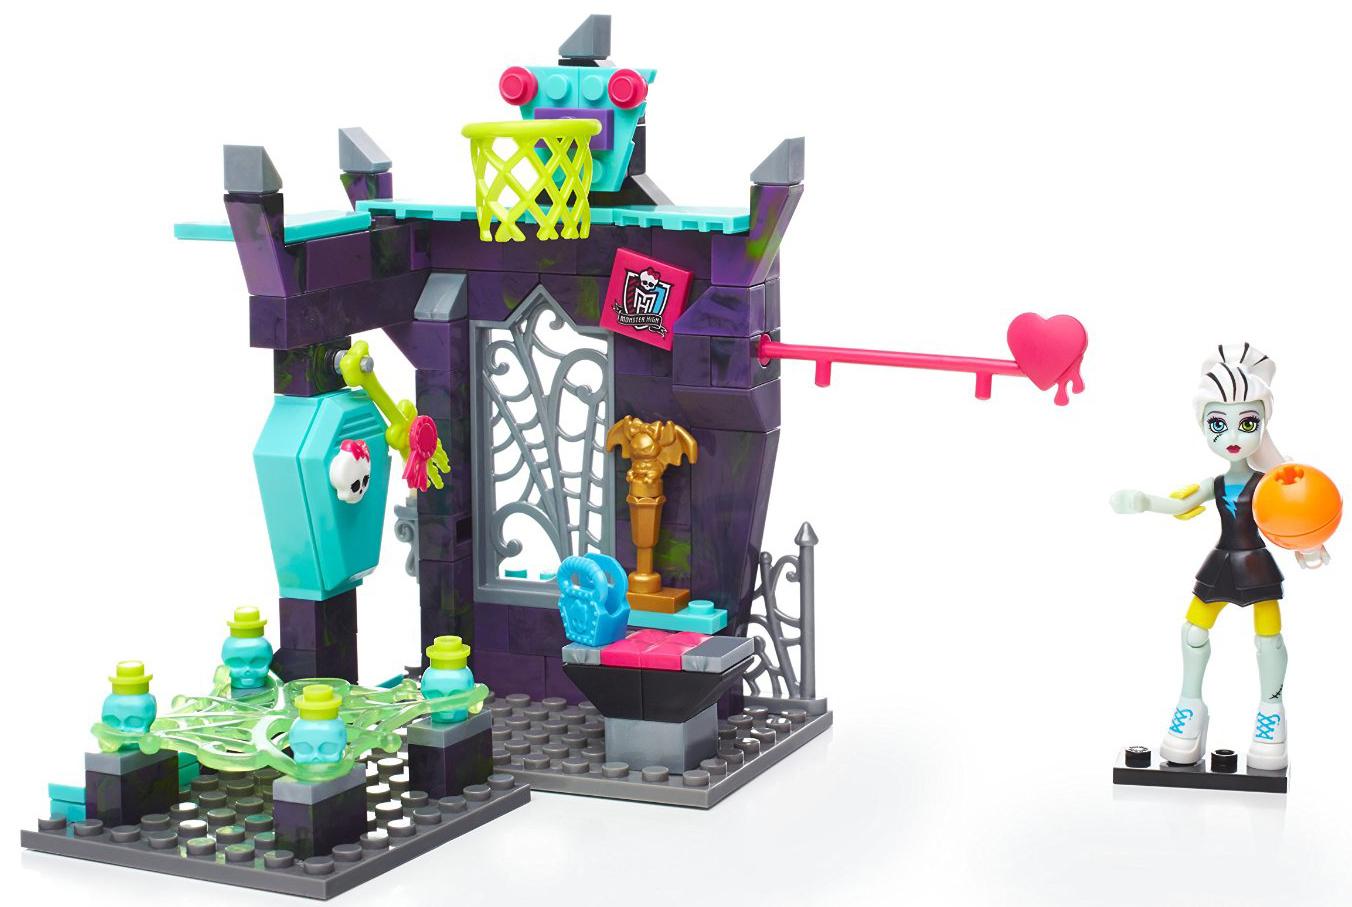 Конструкторы для малышей Mega Bloks Monster High Класс физкультуры mega bloks monster high персонажи монстры скелита калаверас